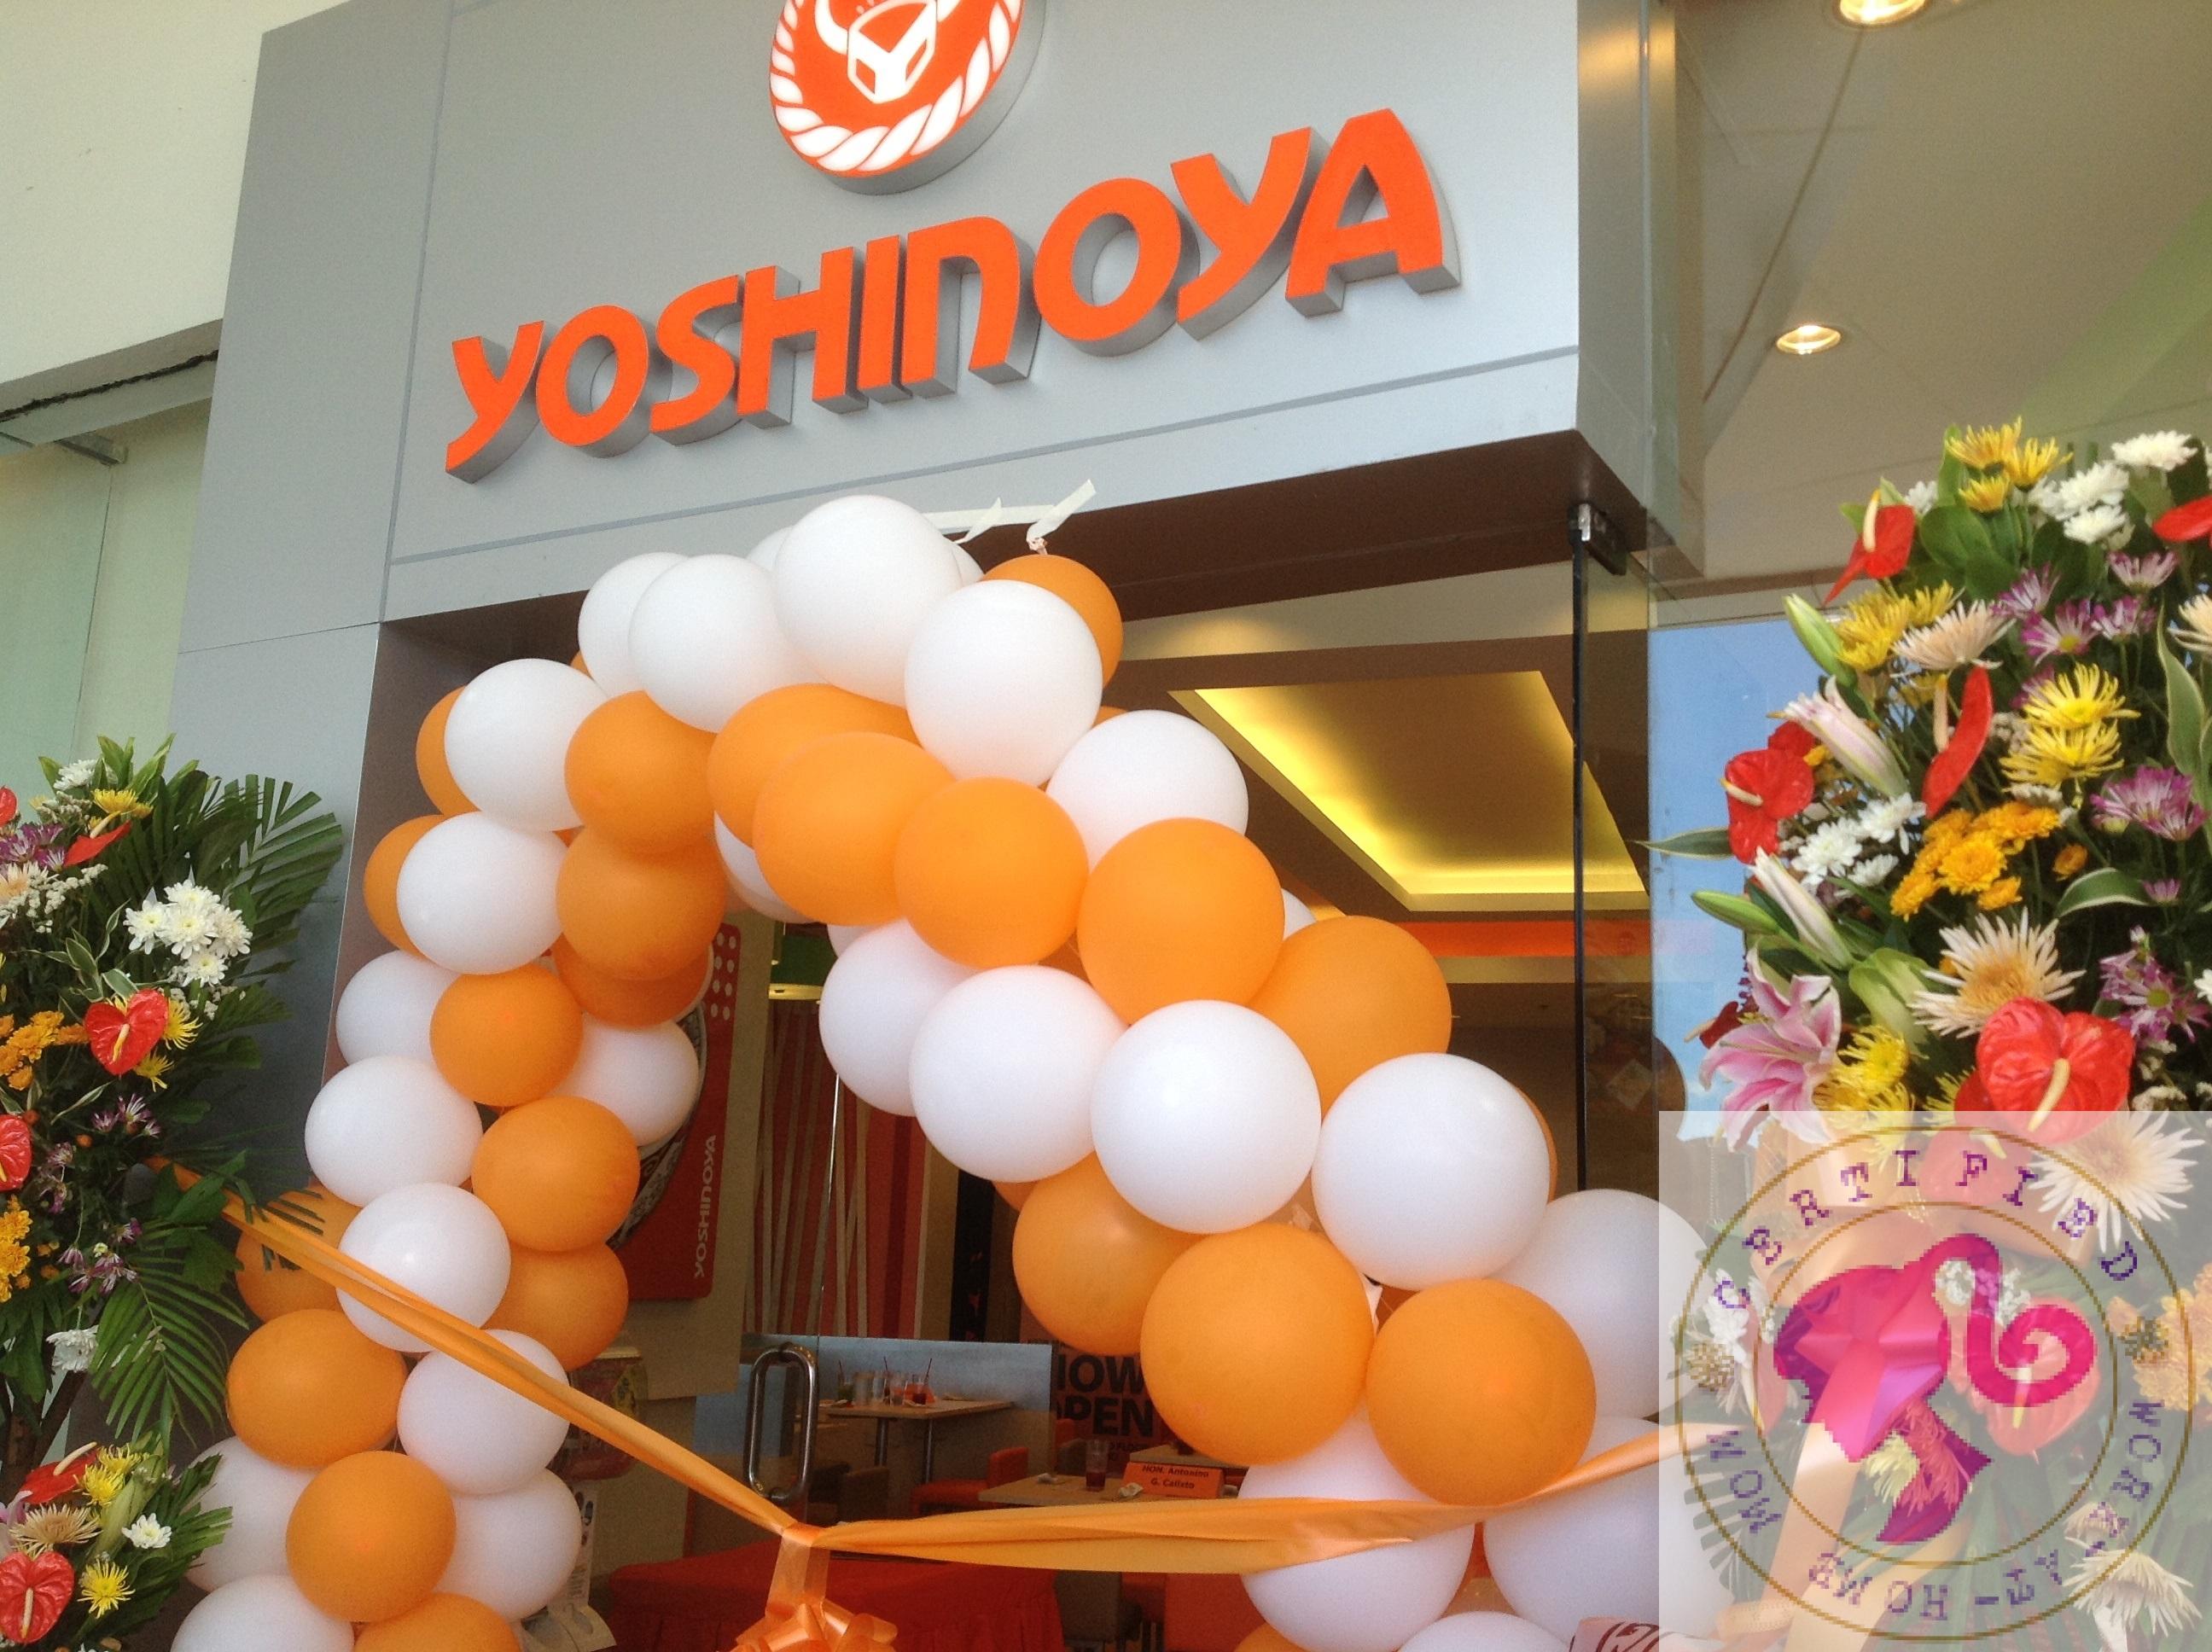 YOSHINOYA's Grand Comeback in SM Mall of Asia (MOA)